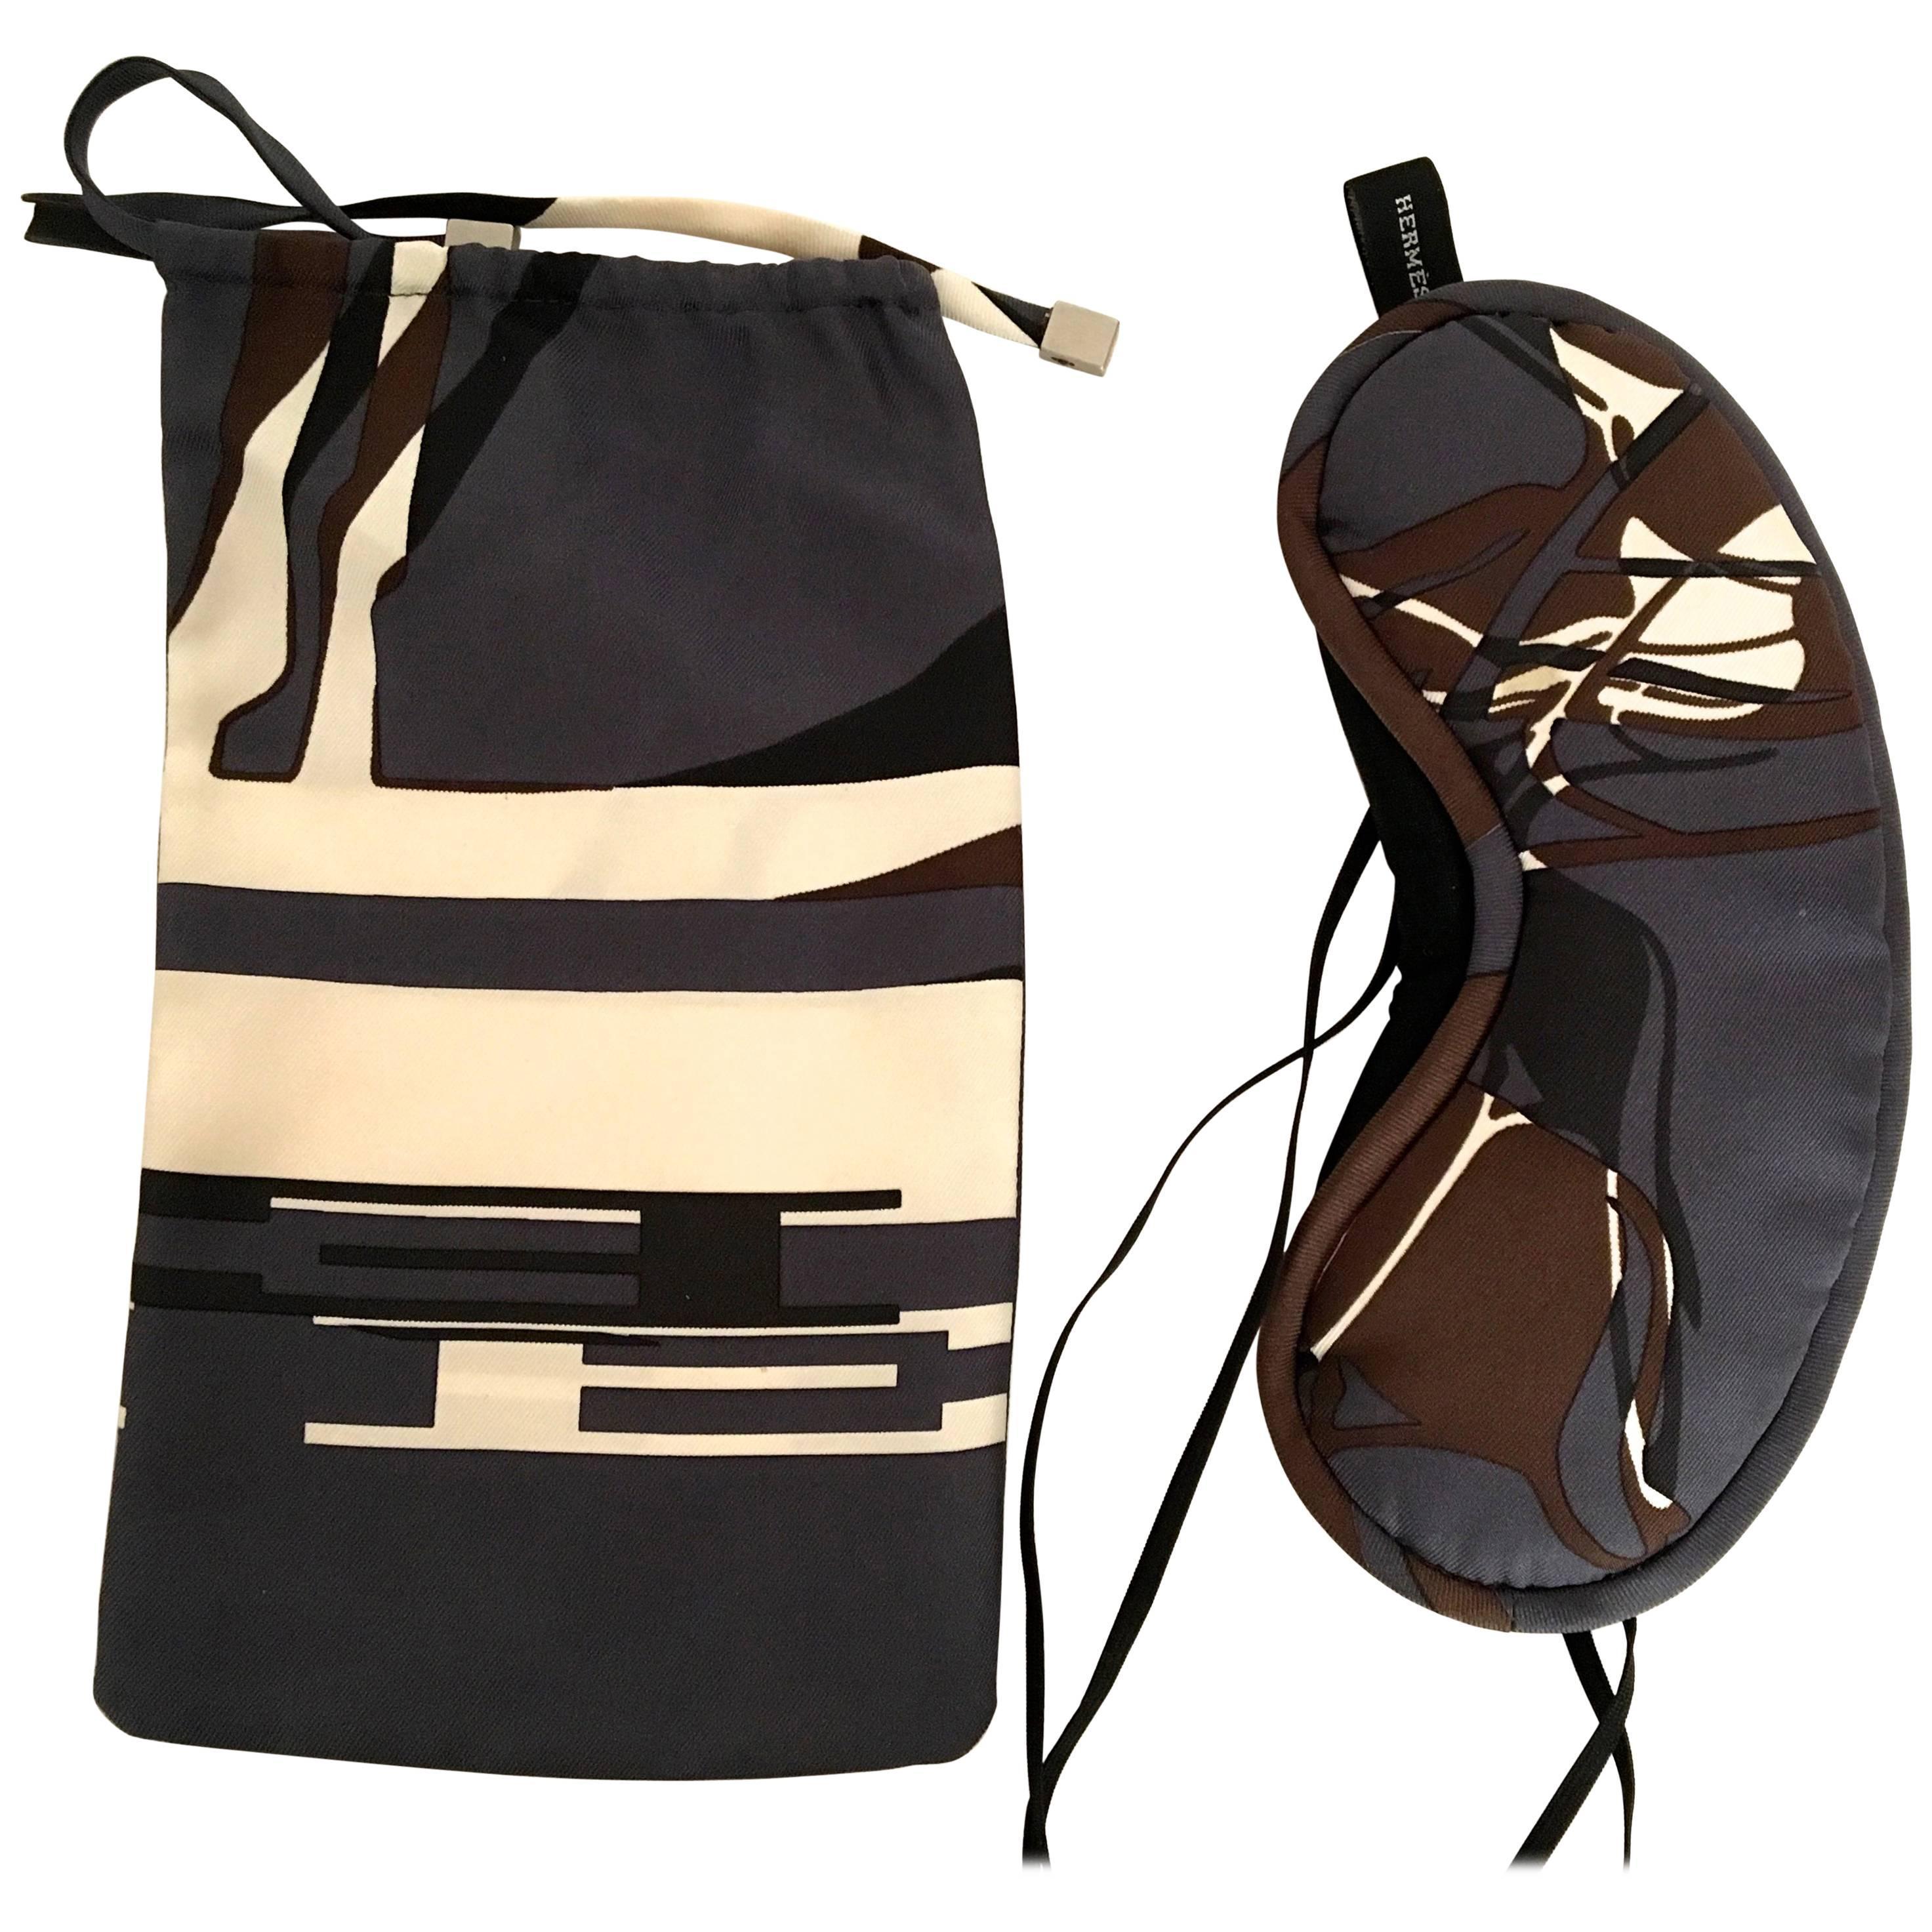 cb46cce083 ... best price hermes silk eye covers w matching bag 100 silk c468c 8ed8b